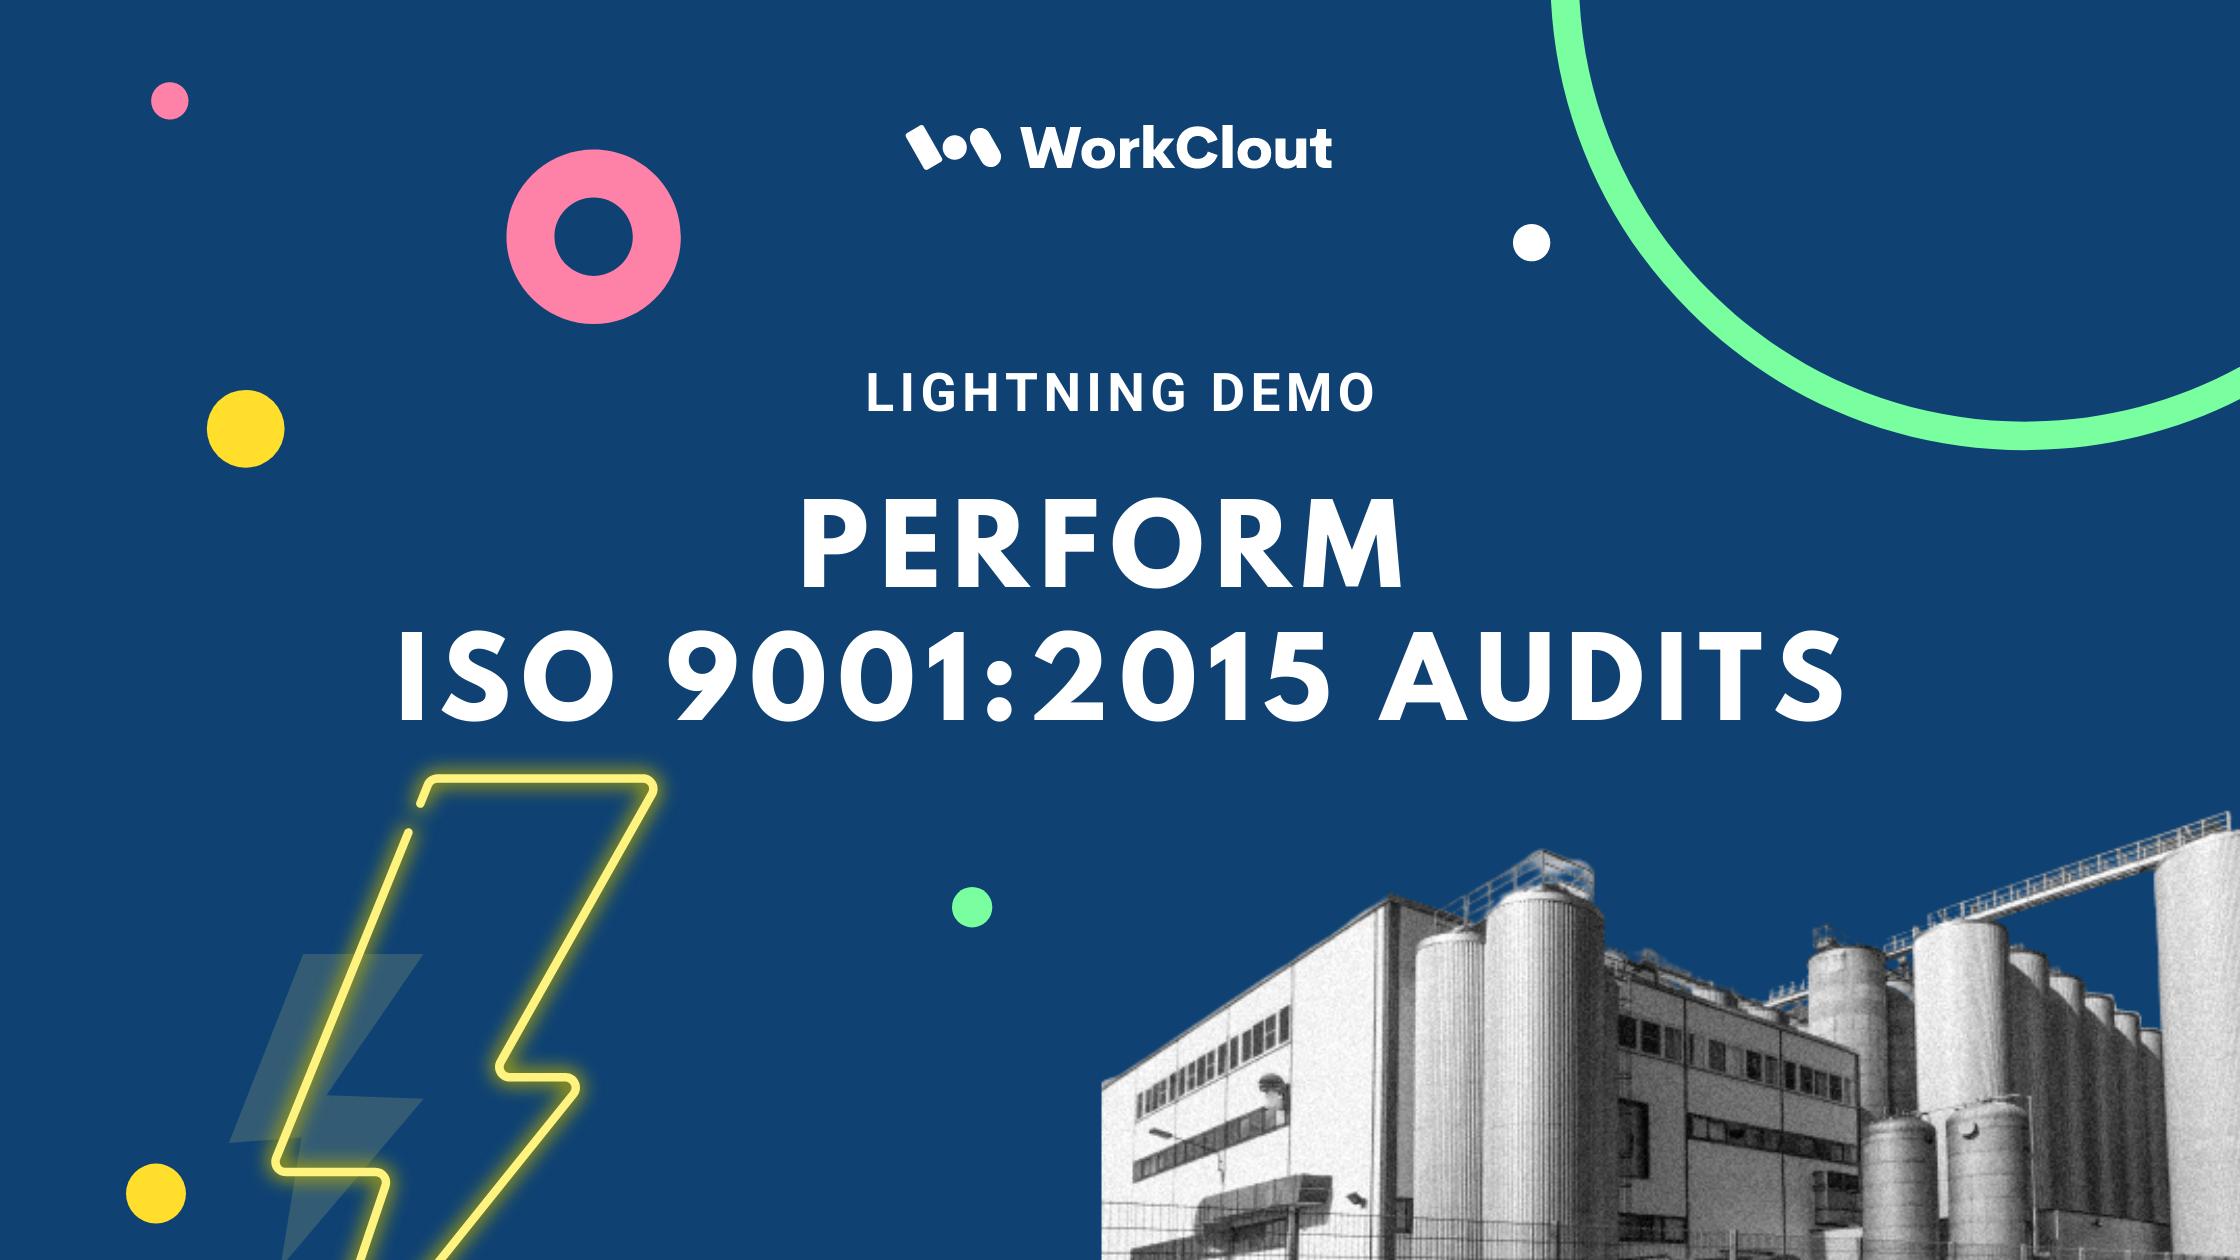 Lightning Demo - Performing ISO 9001:2015 Audits